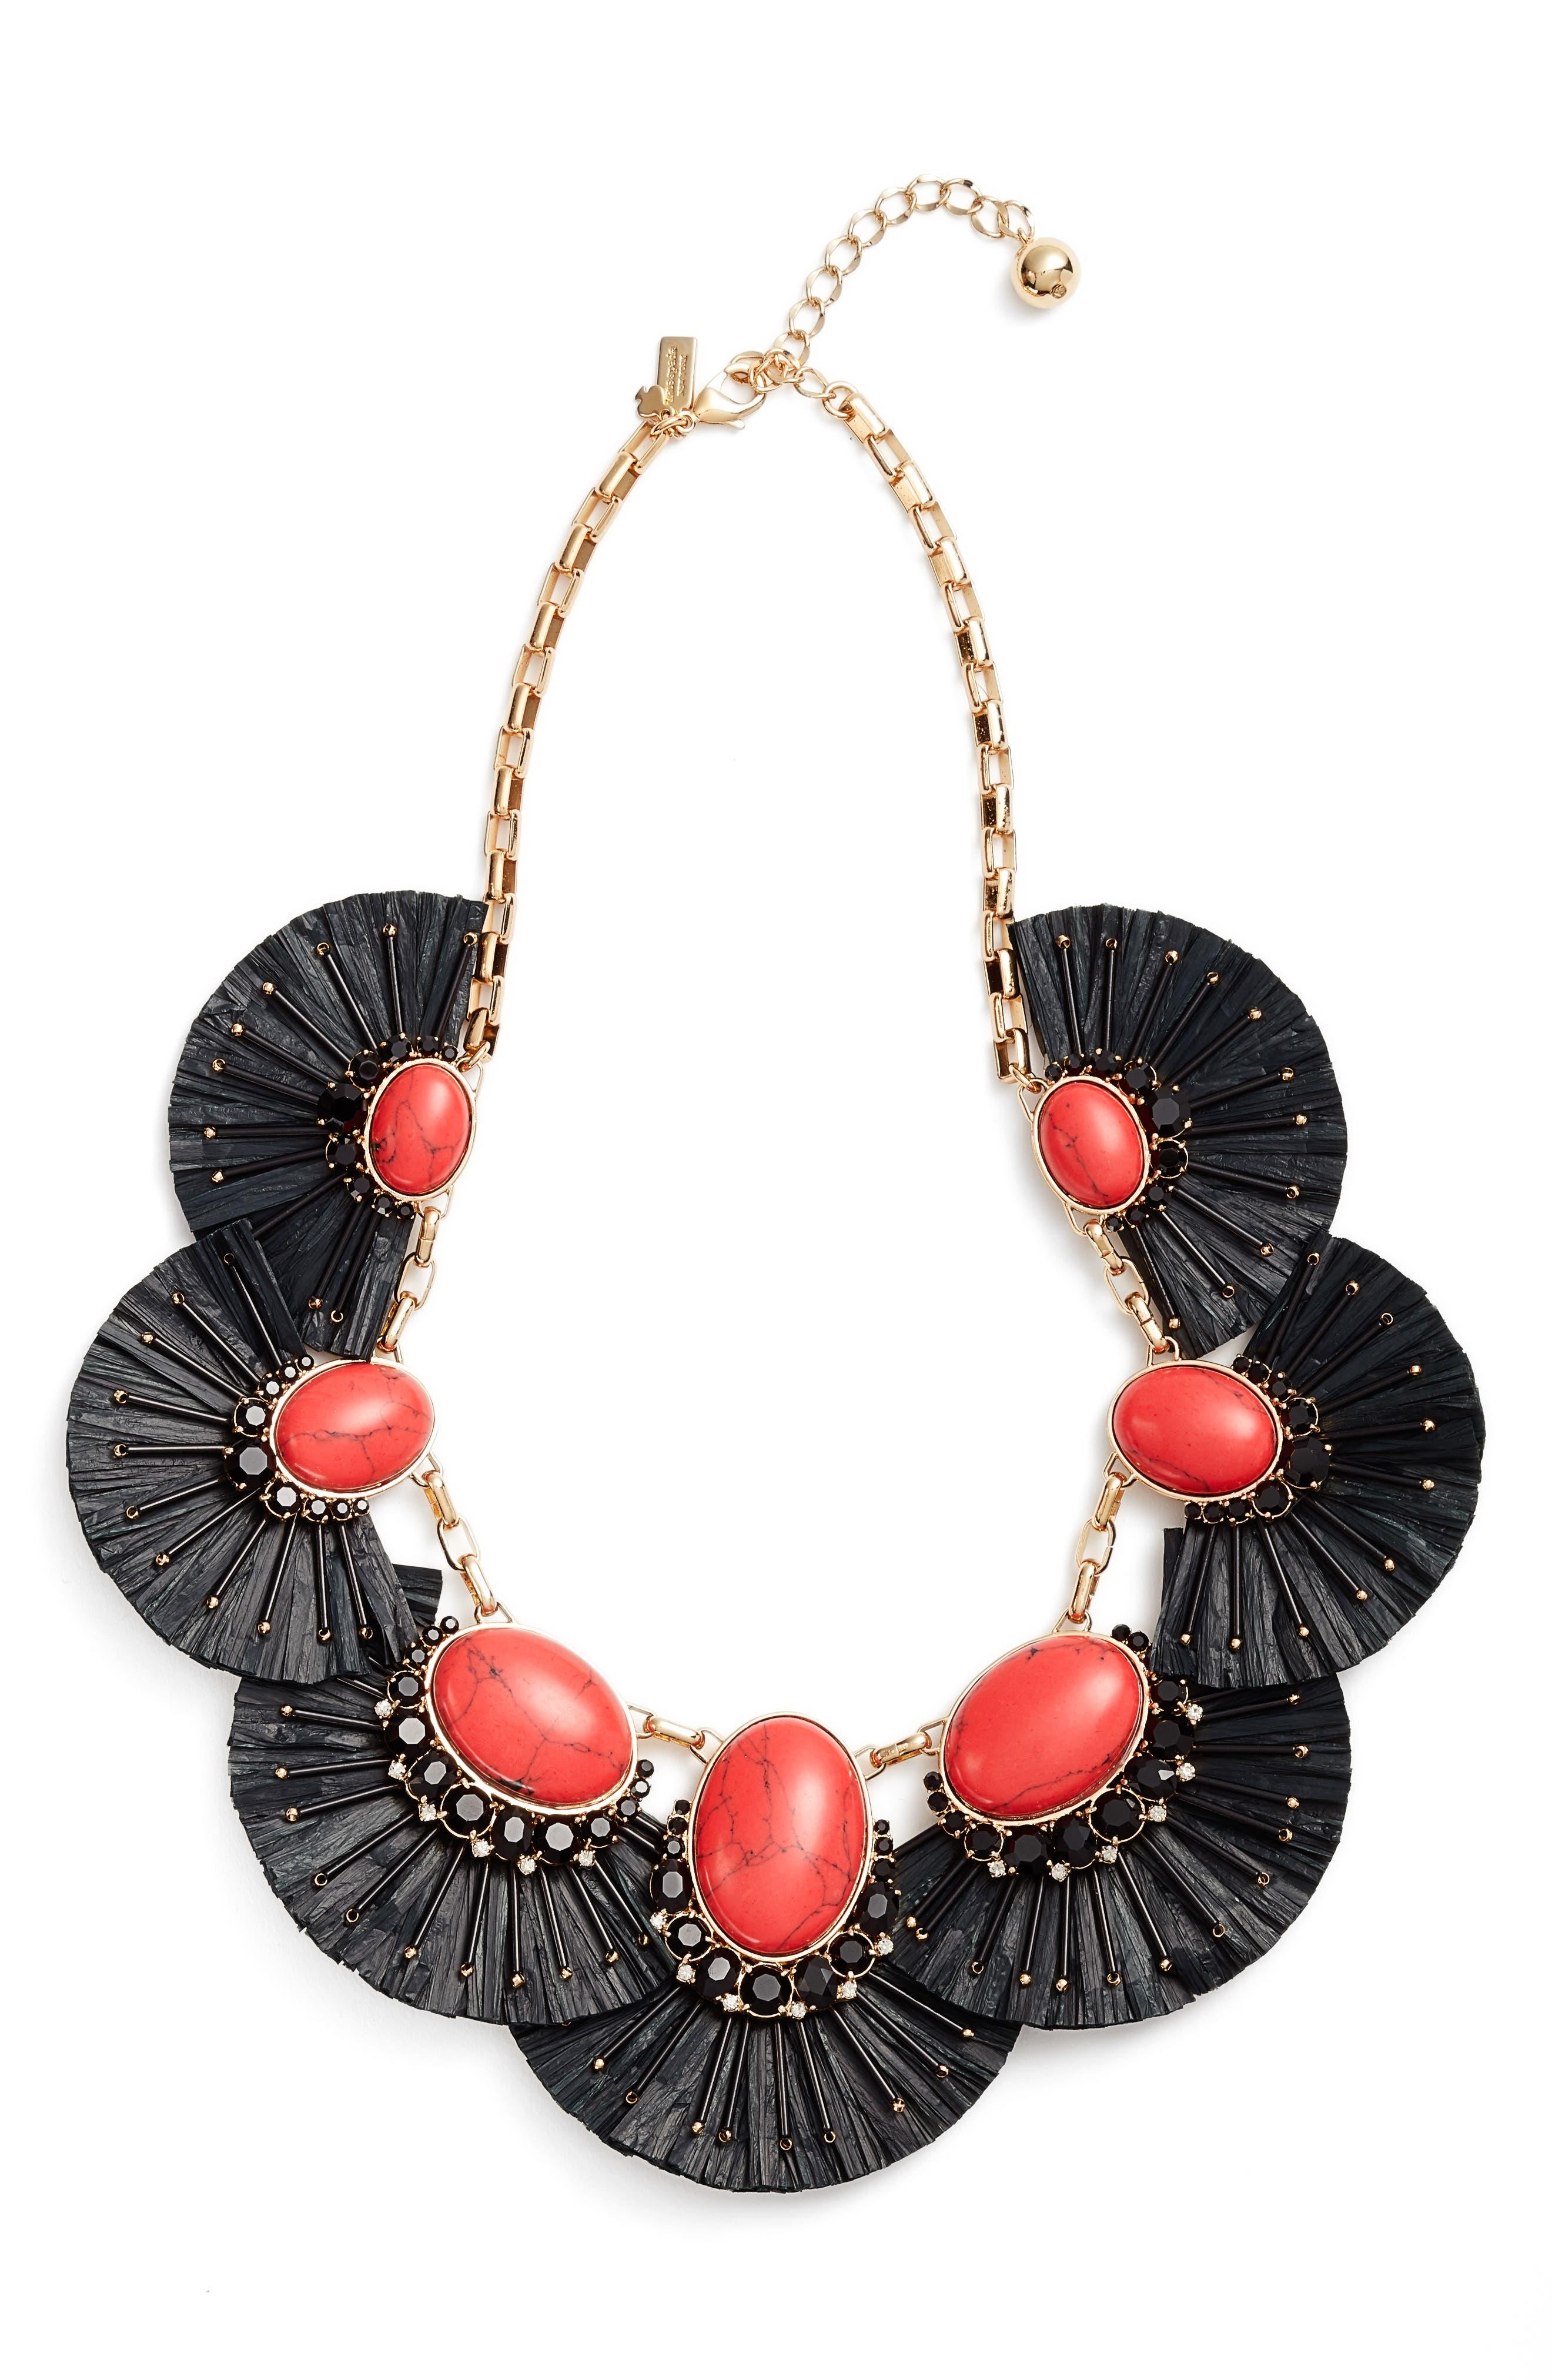 KATE SPADE NEW YORK fiesta fringe statement necklace